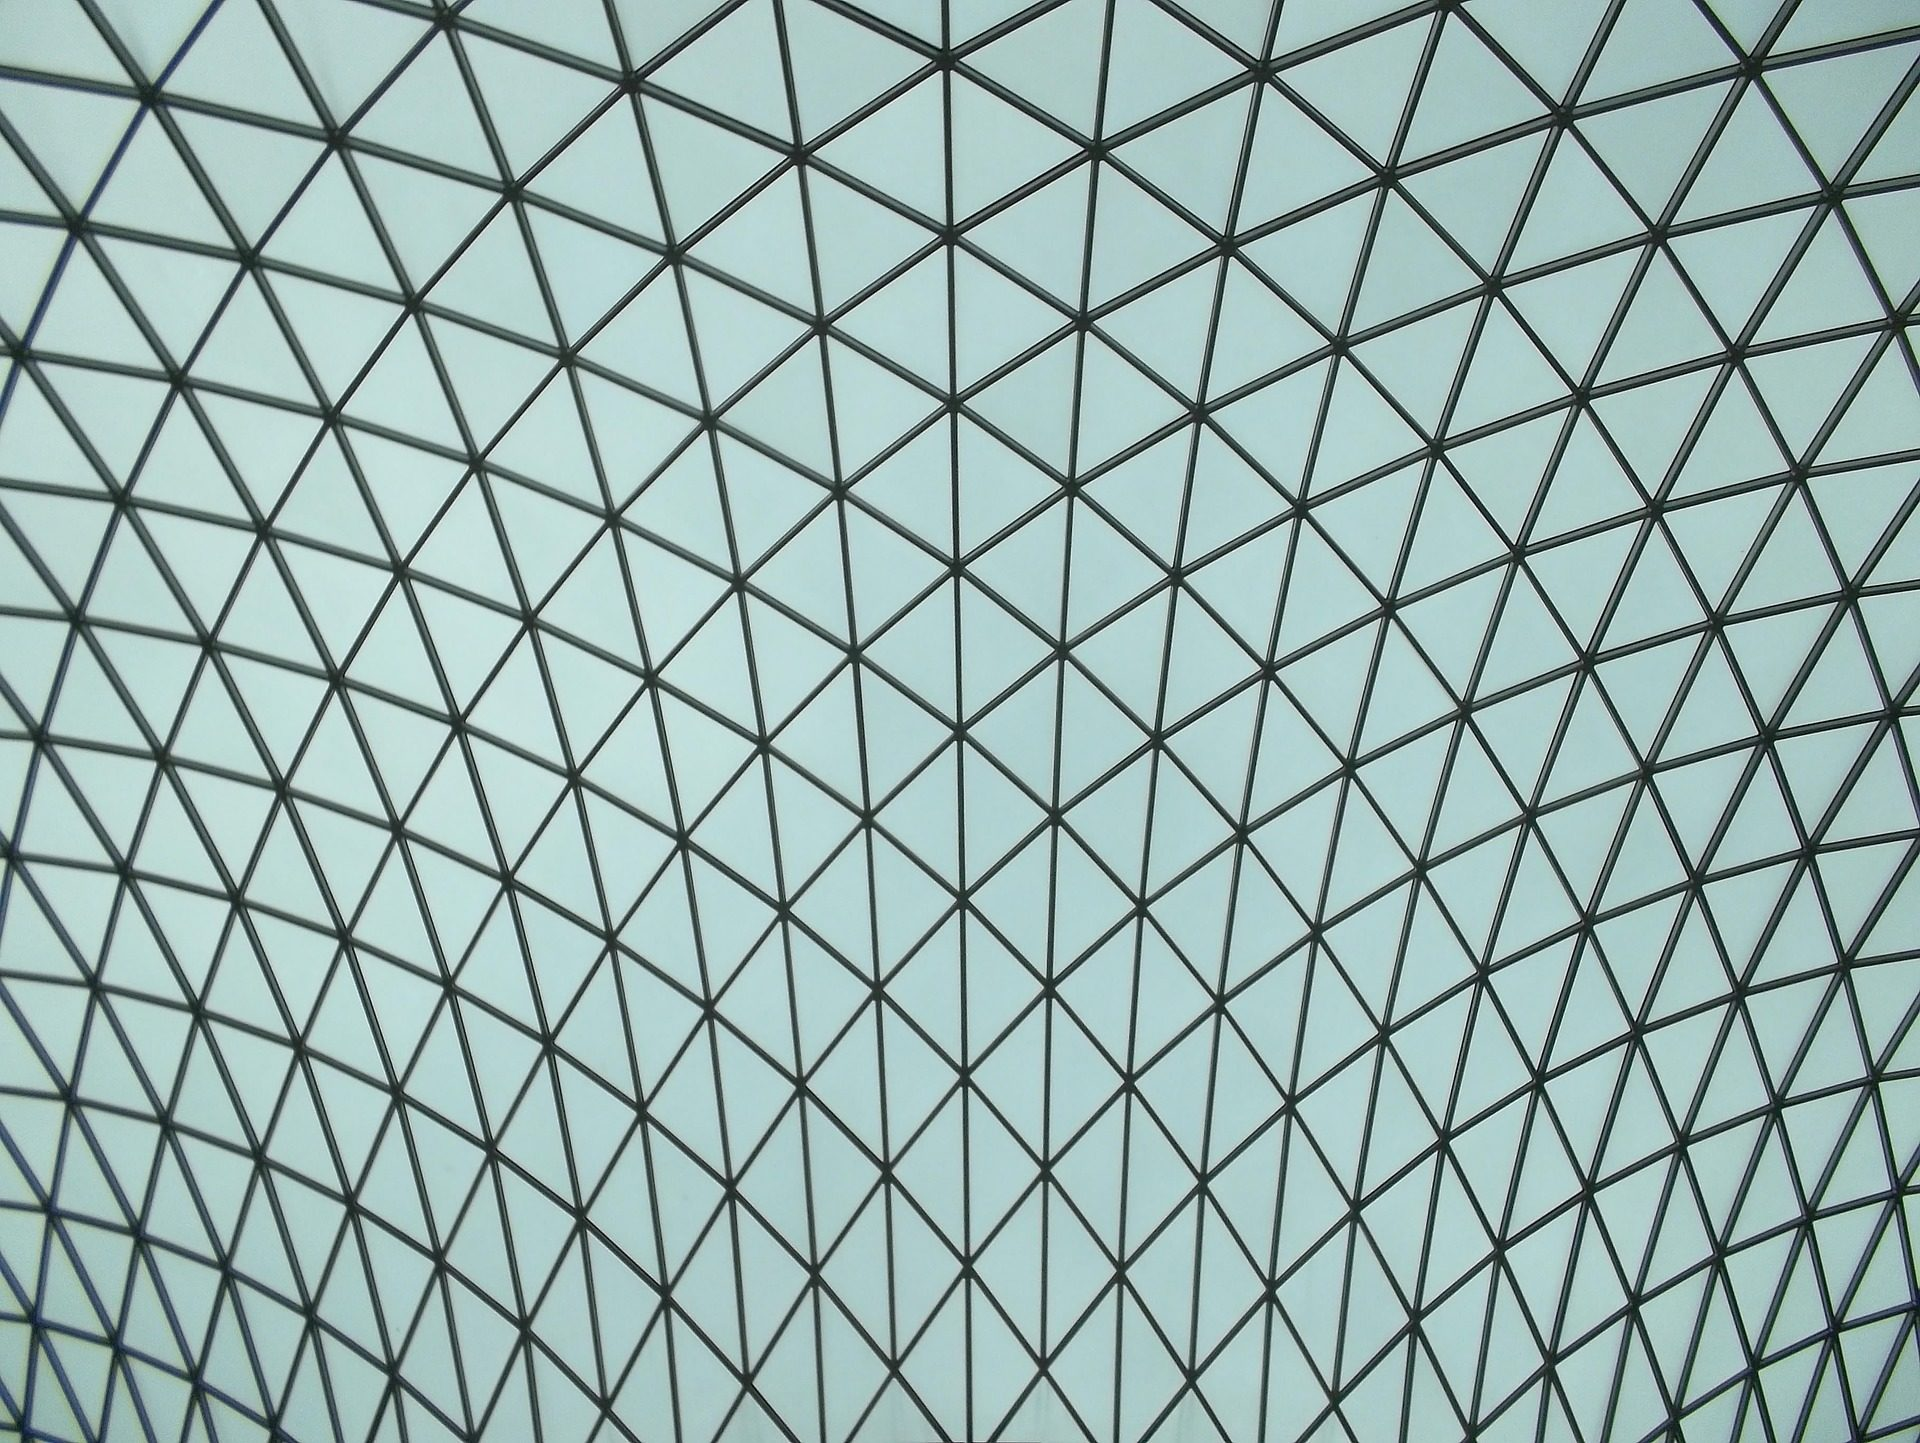 Fondos arquitectura abstracto hd spanish hd wallpapers for Arquitectura en linea gratis